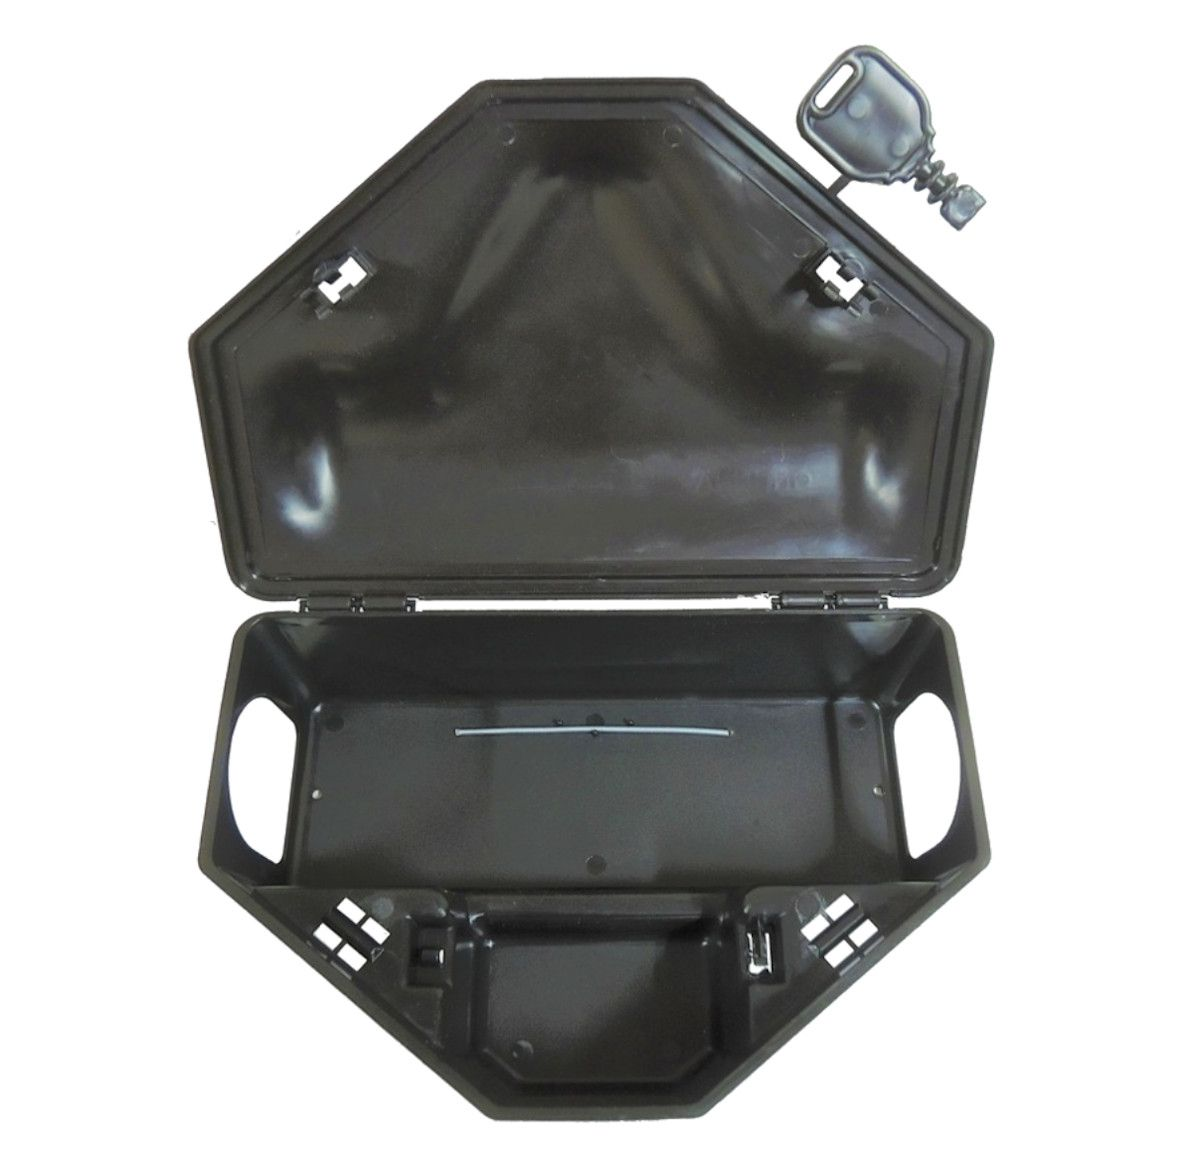 Kit 6 Porta Isca Com Chave - Super Reforçado